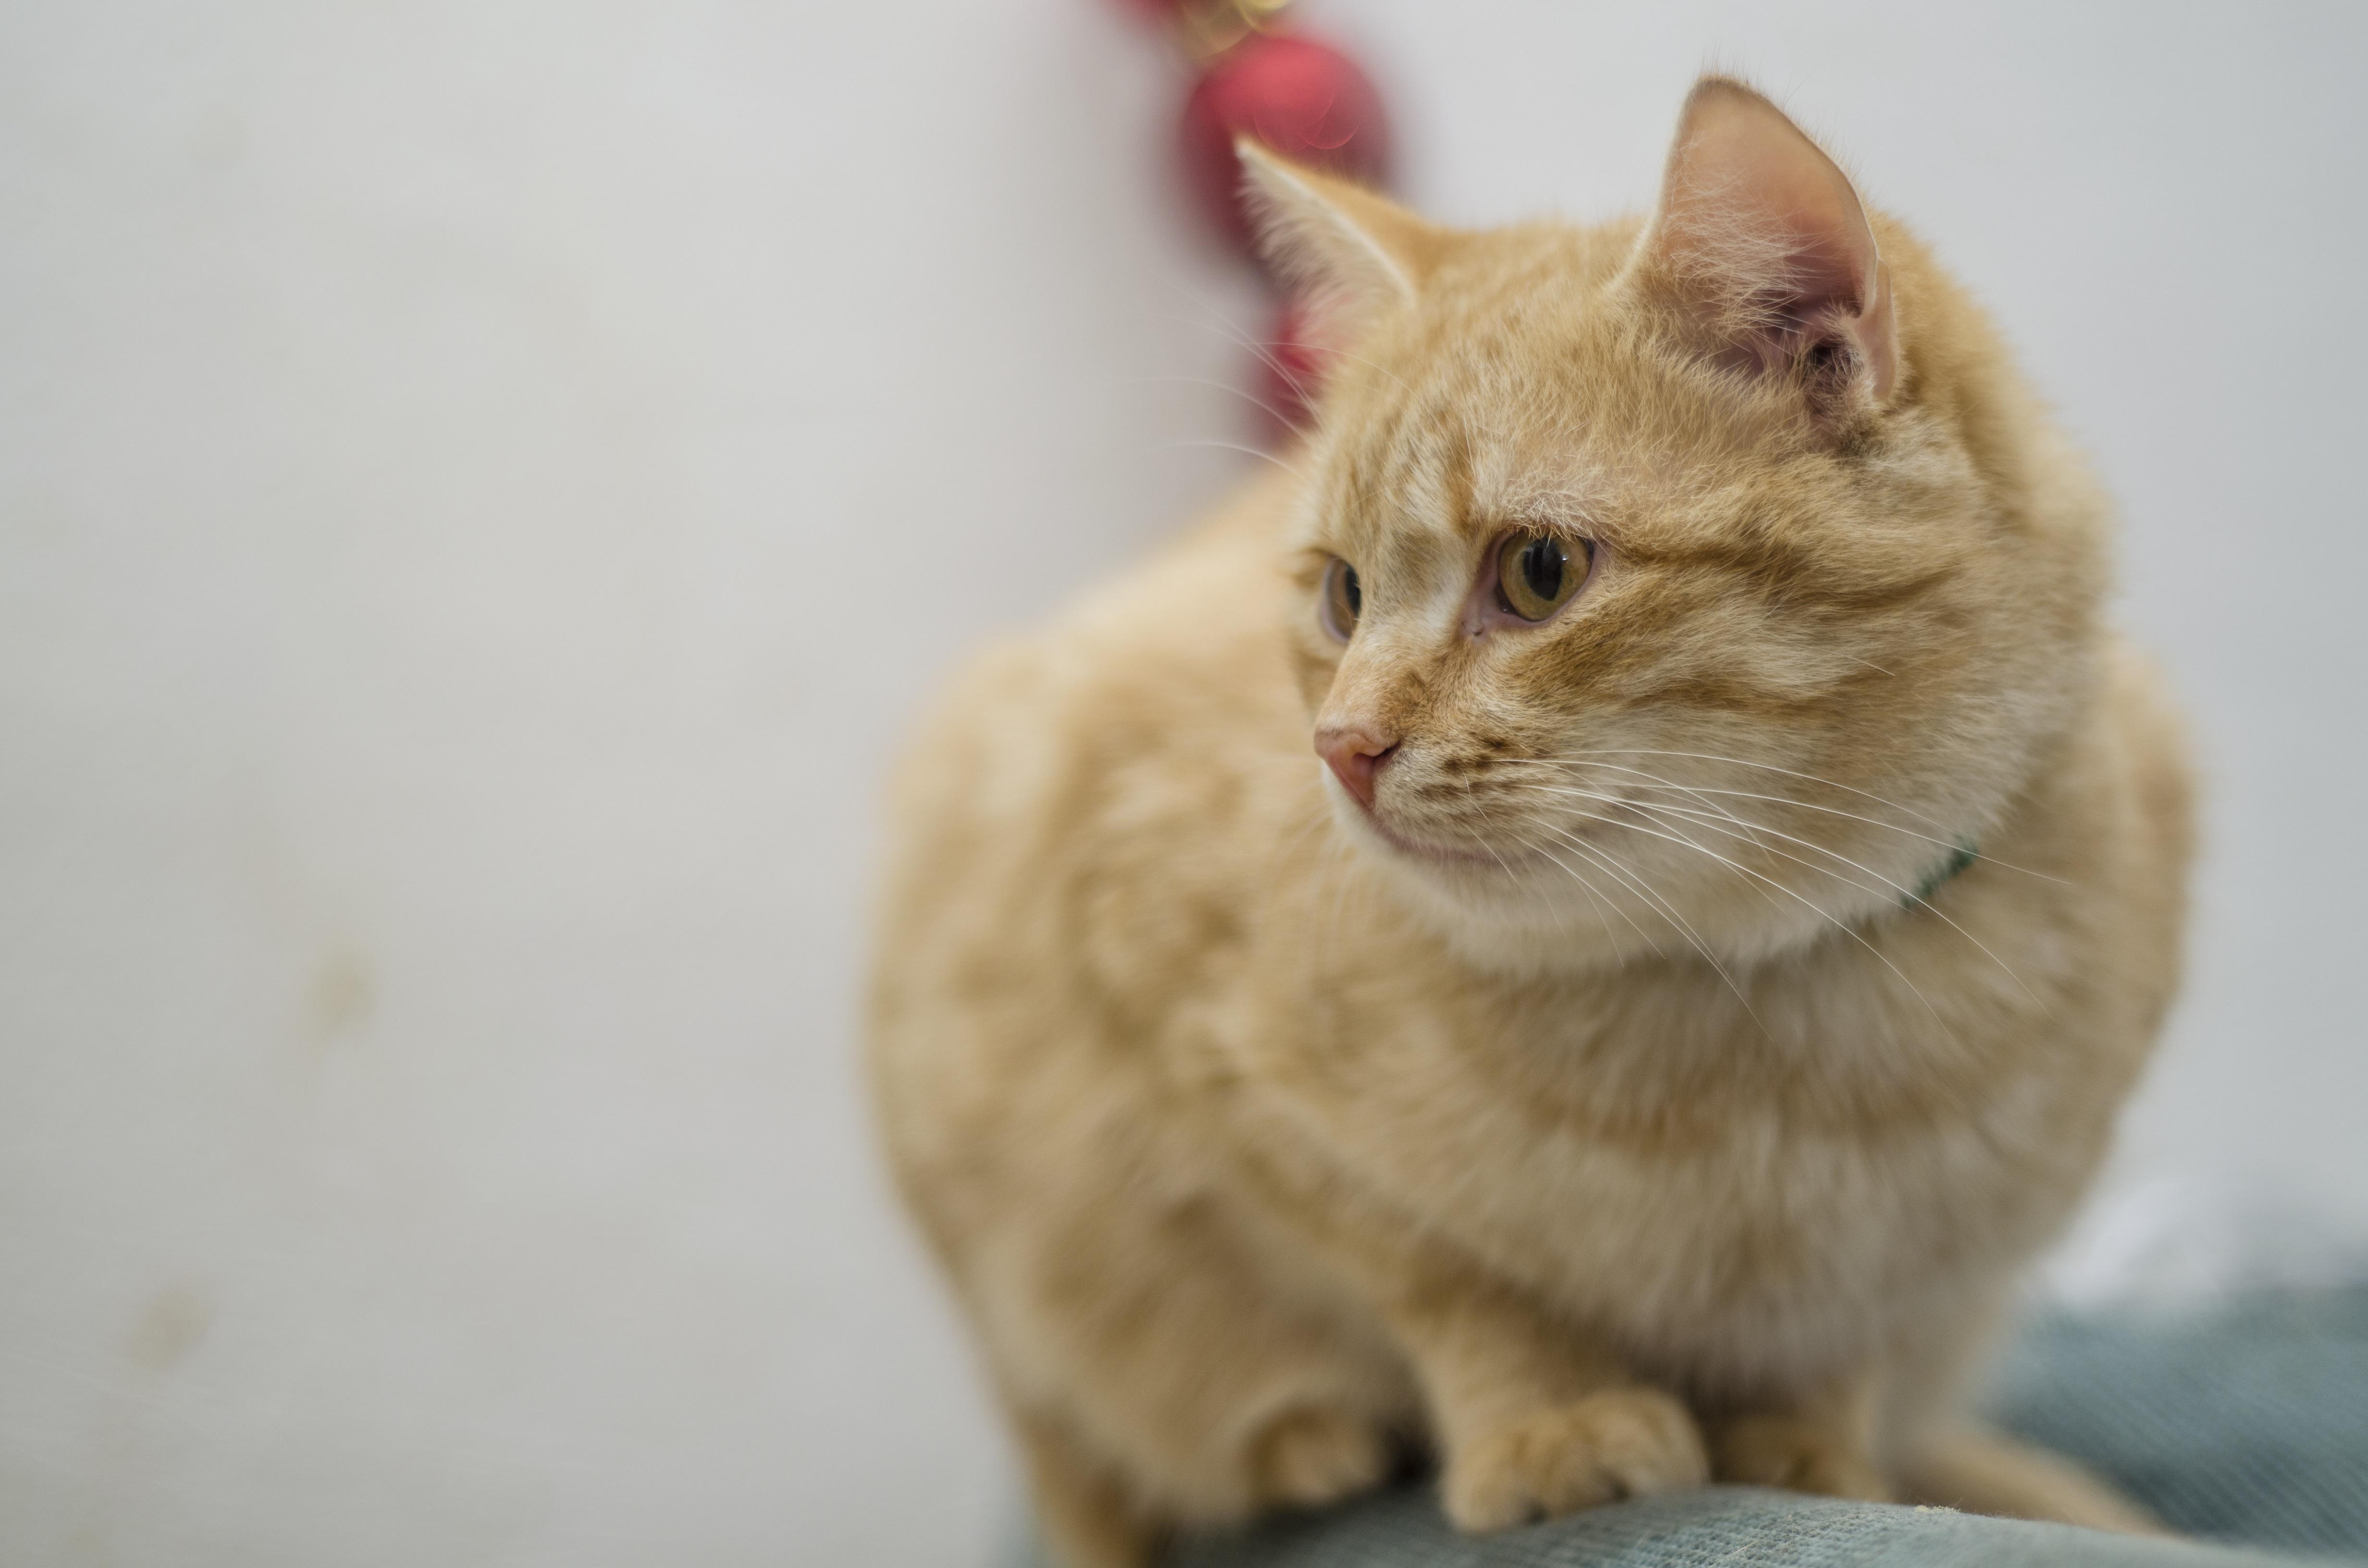 orange and white striped cat breed